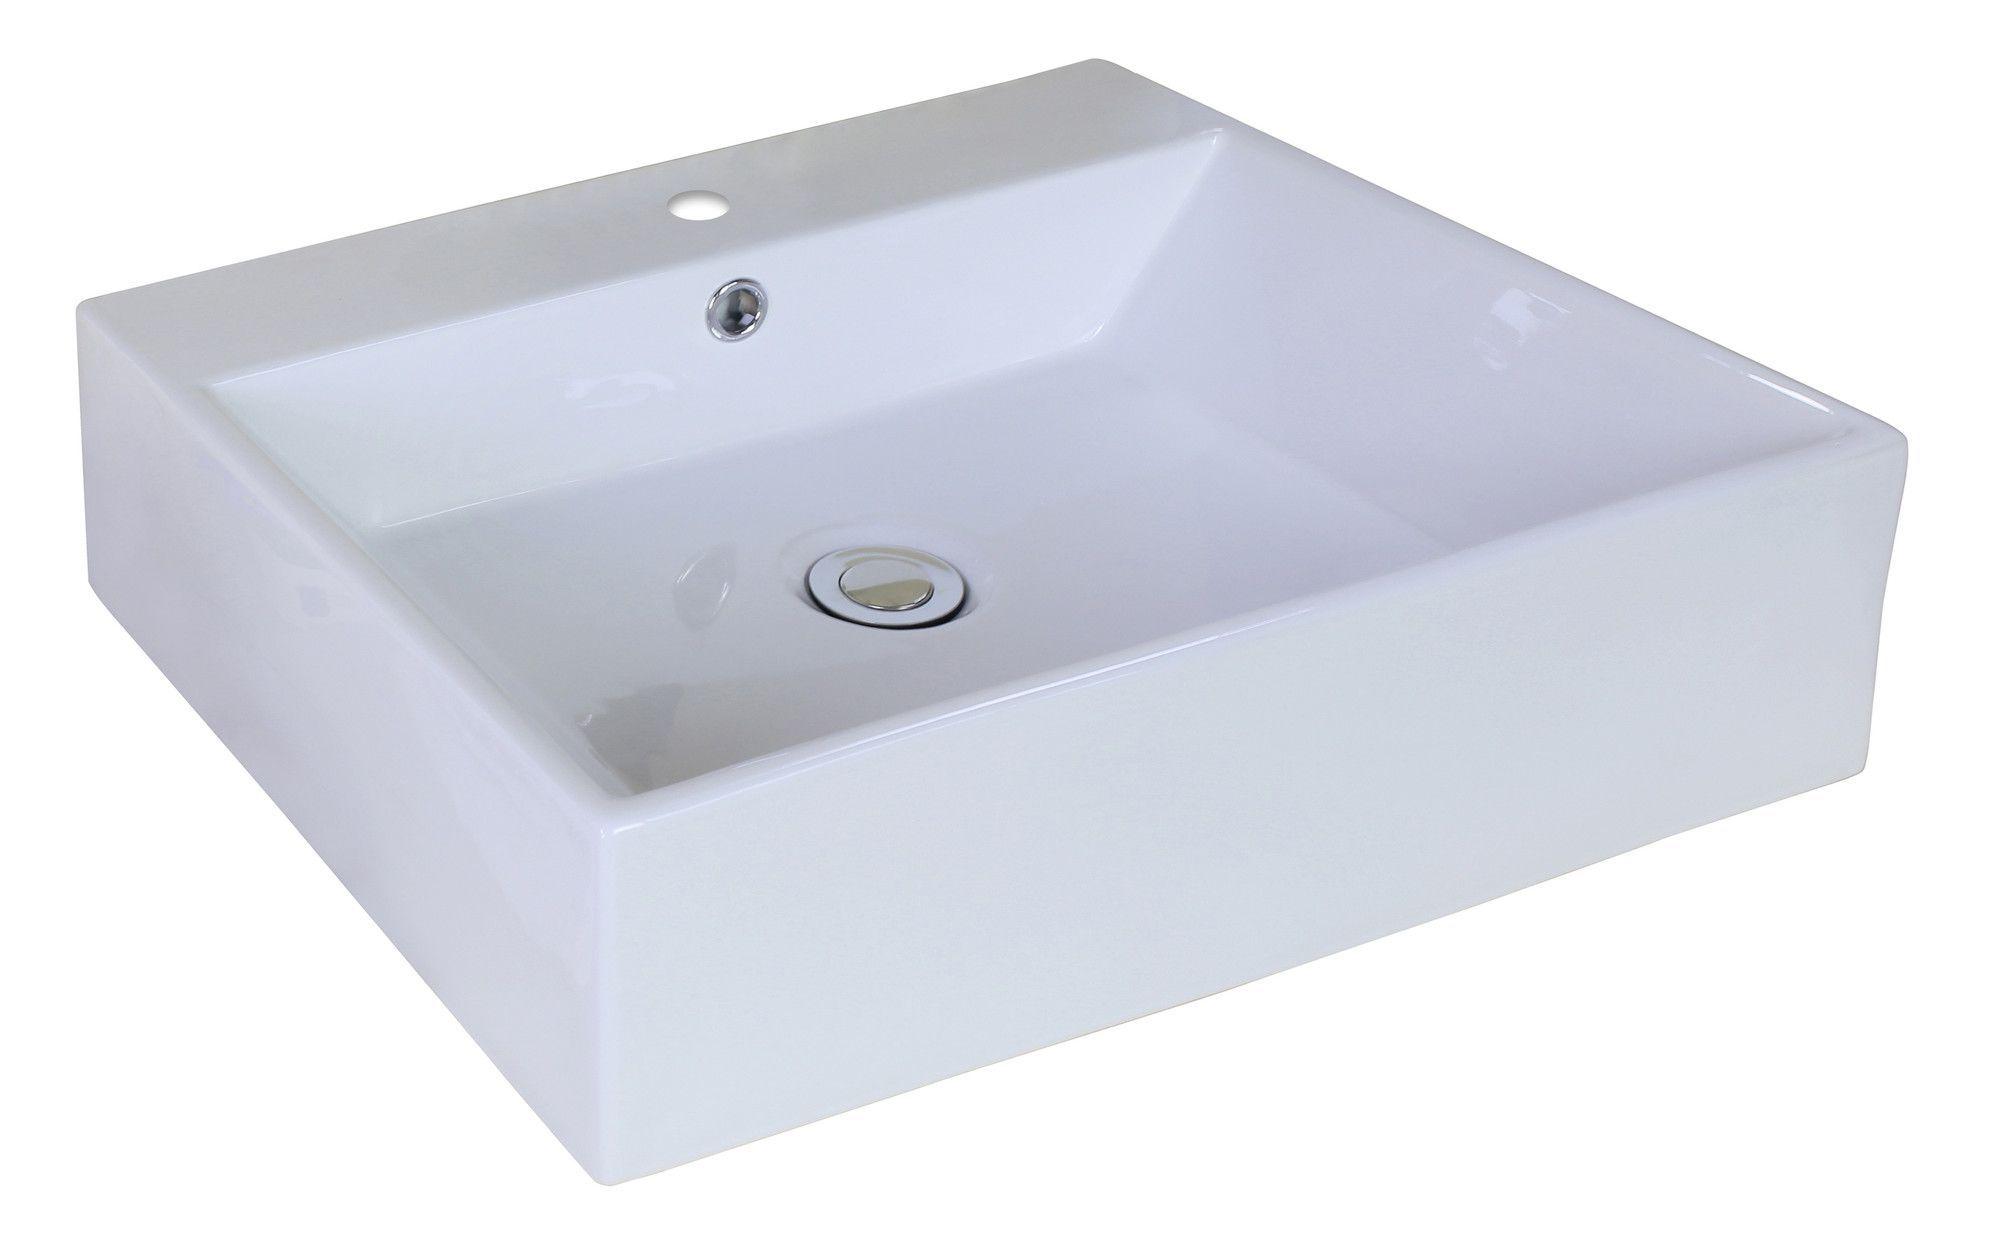 Amazing Vintagetubs Component - Bathtub Design Ideas - klotsnet.com